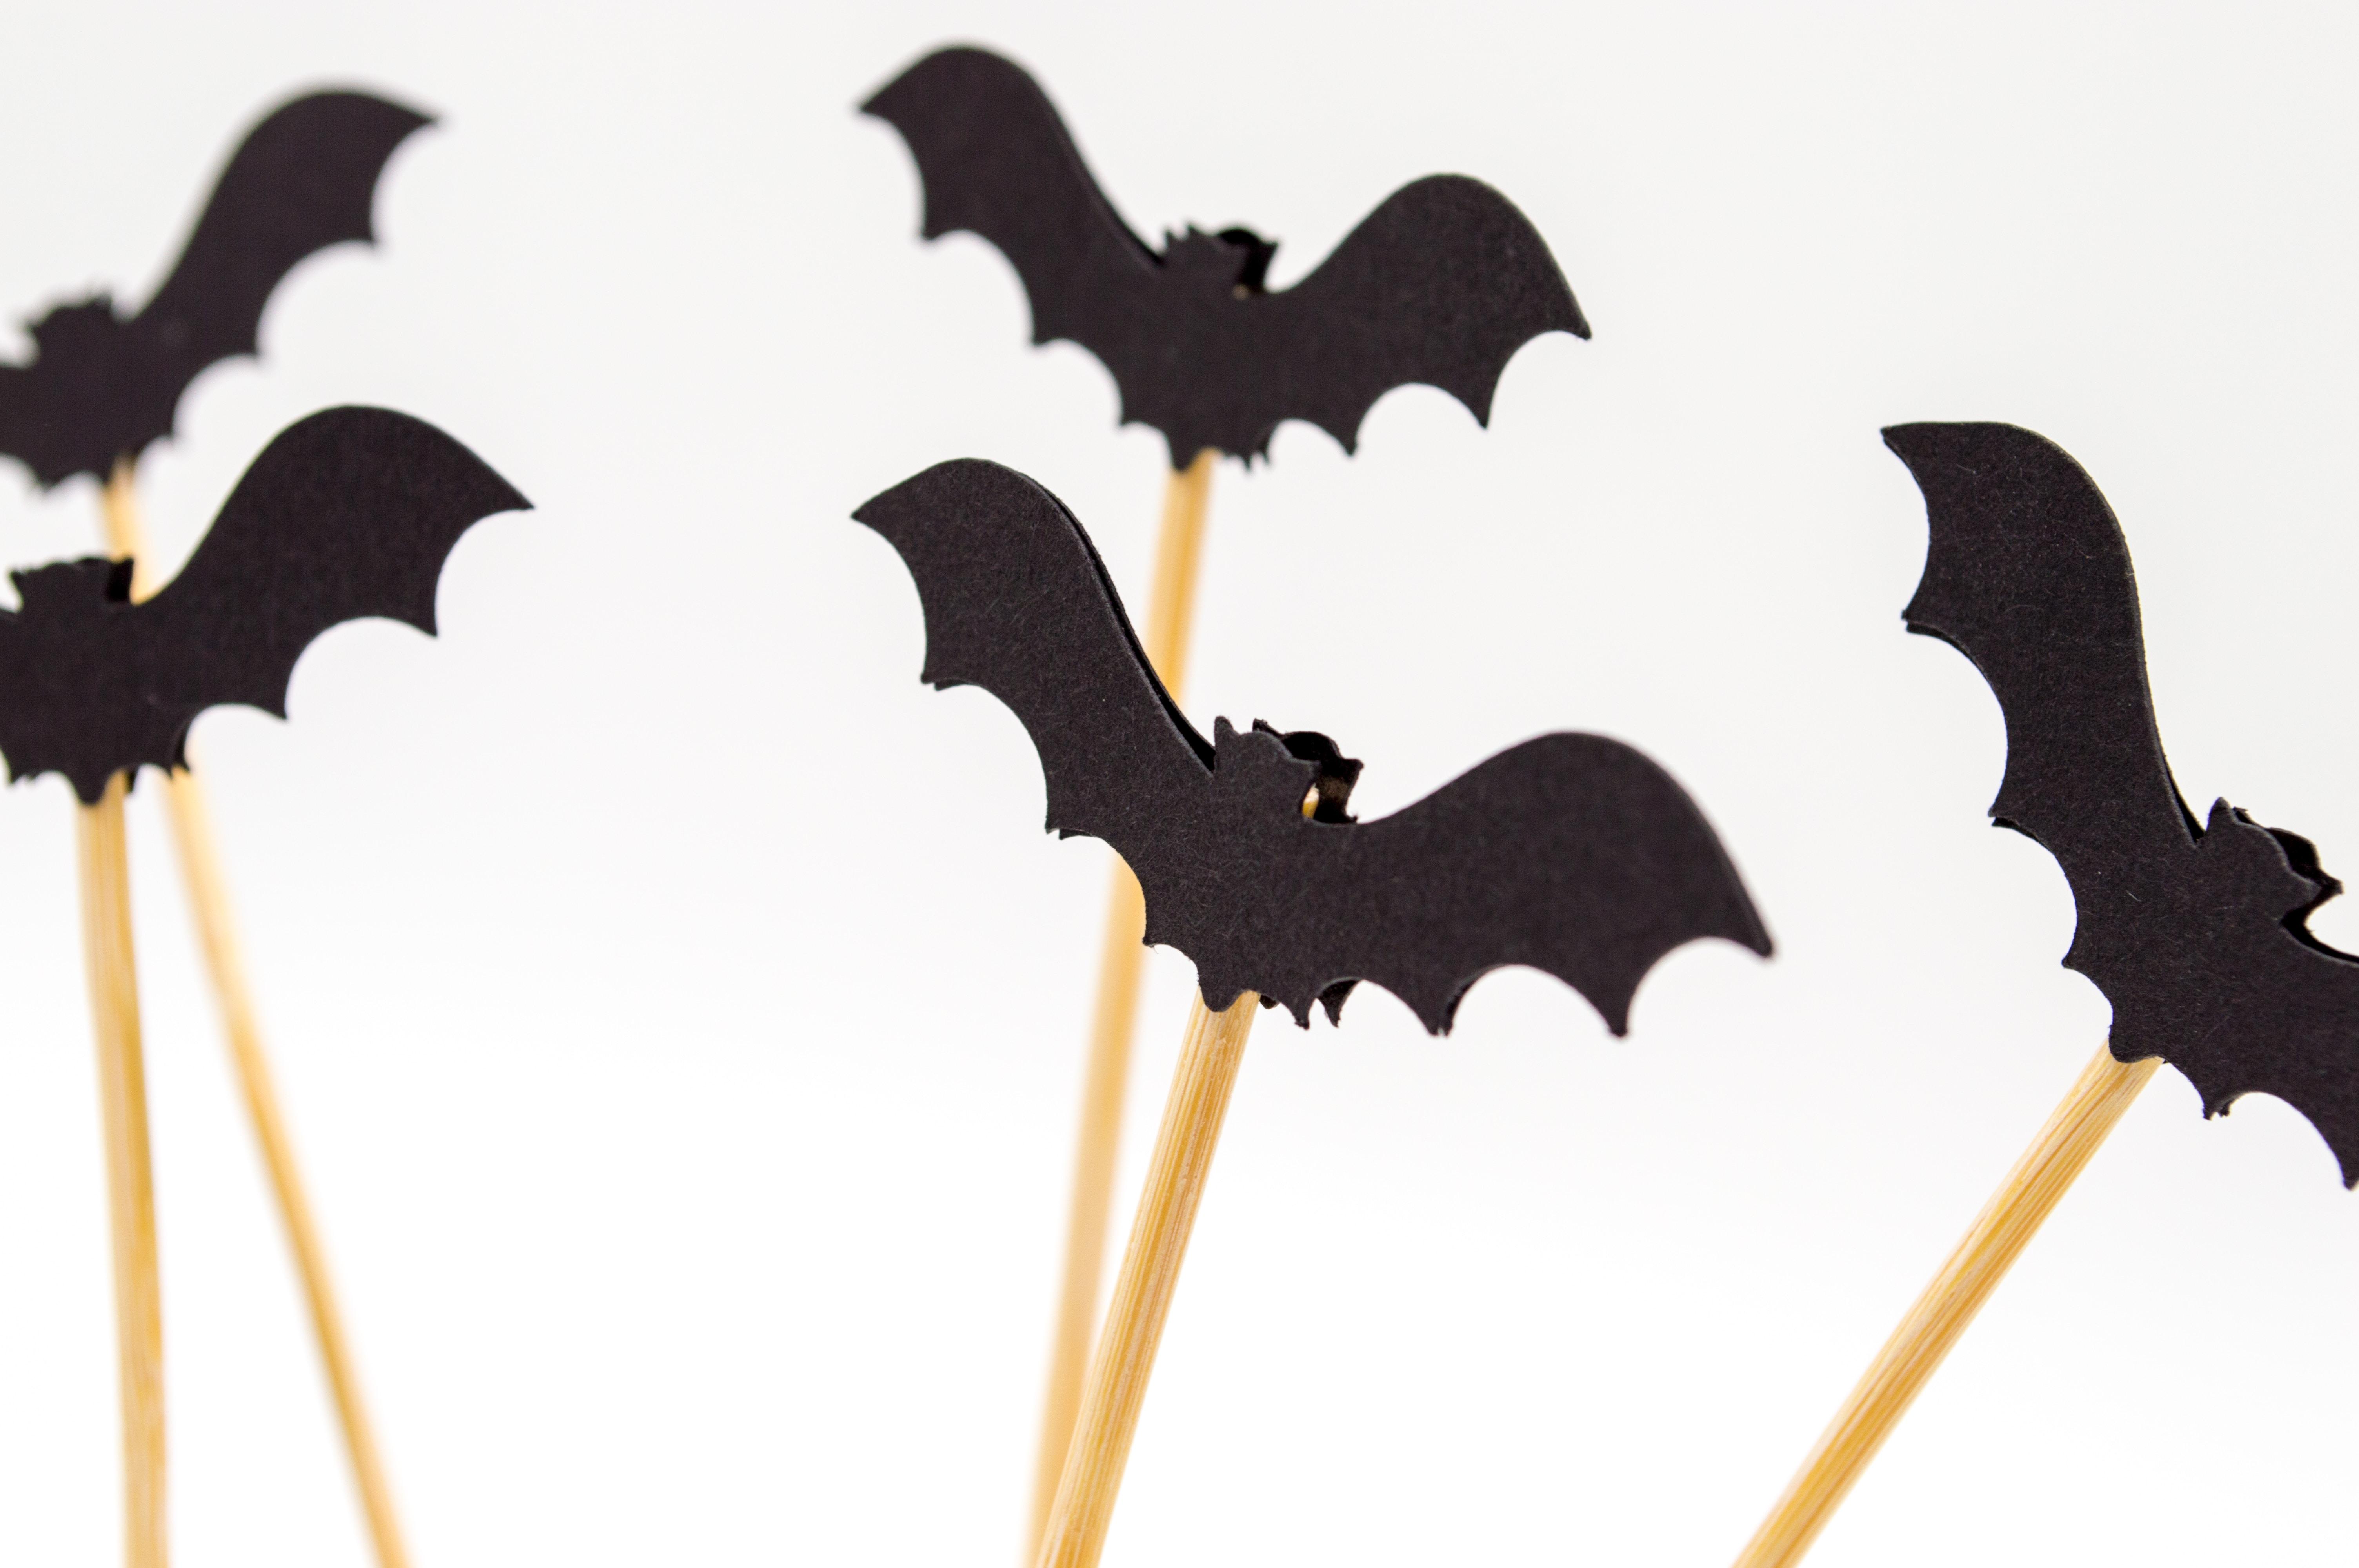 five black toy bats with sticks